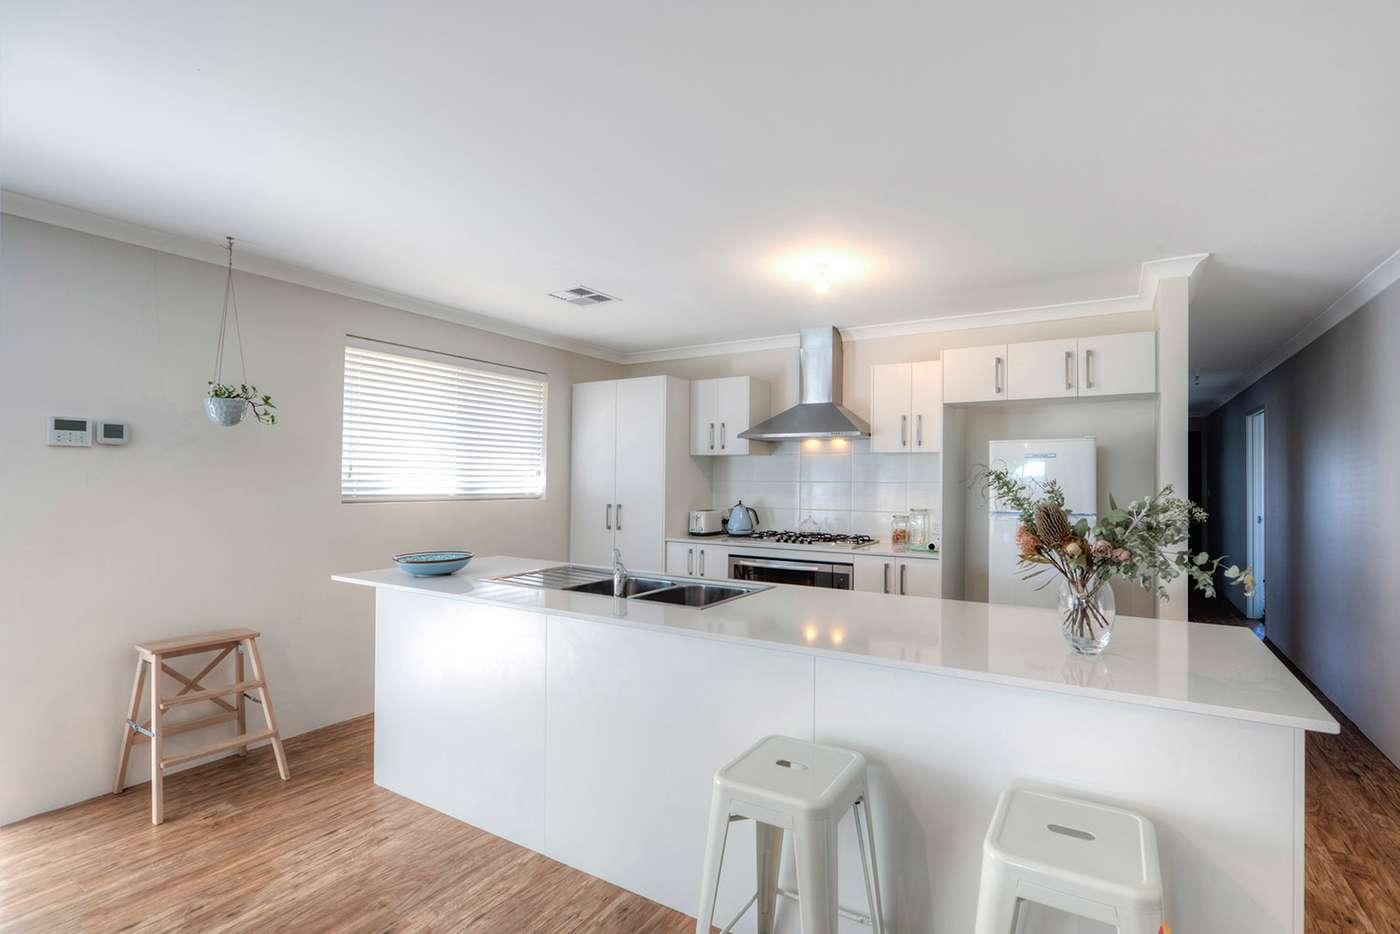 Sixth view of Homely house listing, 190 Suffolk Street, Caversham WA 6055